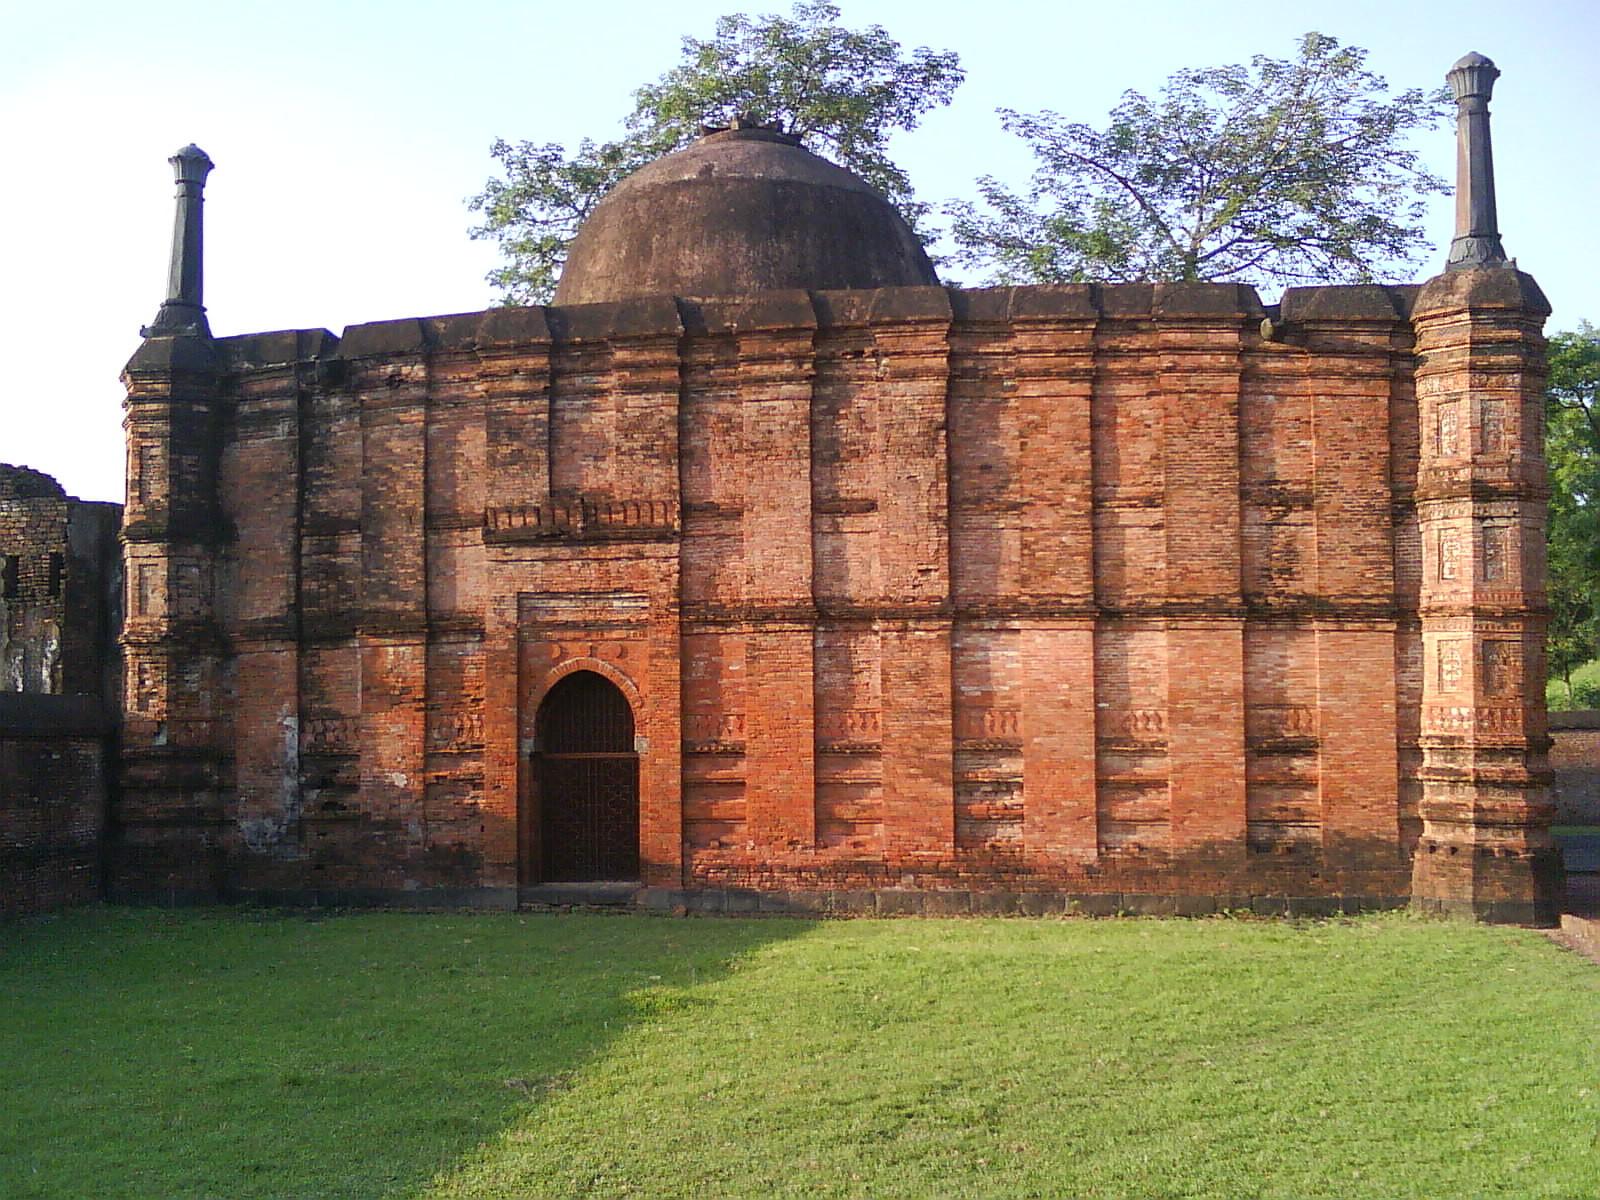 File:Qadam Rasul Mosque.JPG - Wikimedia Commons